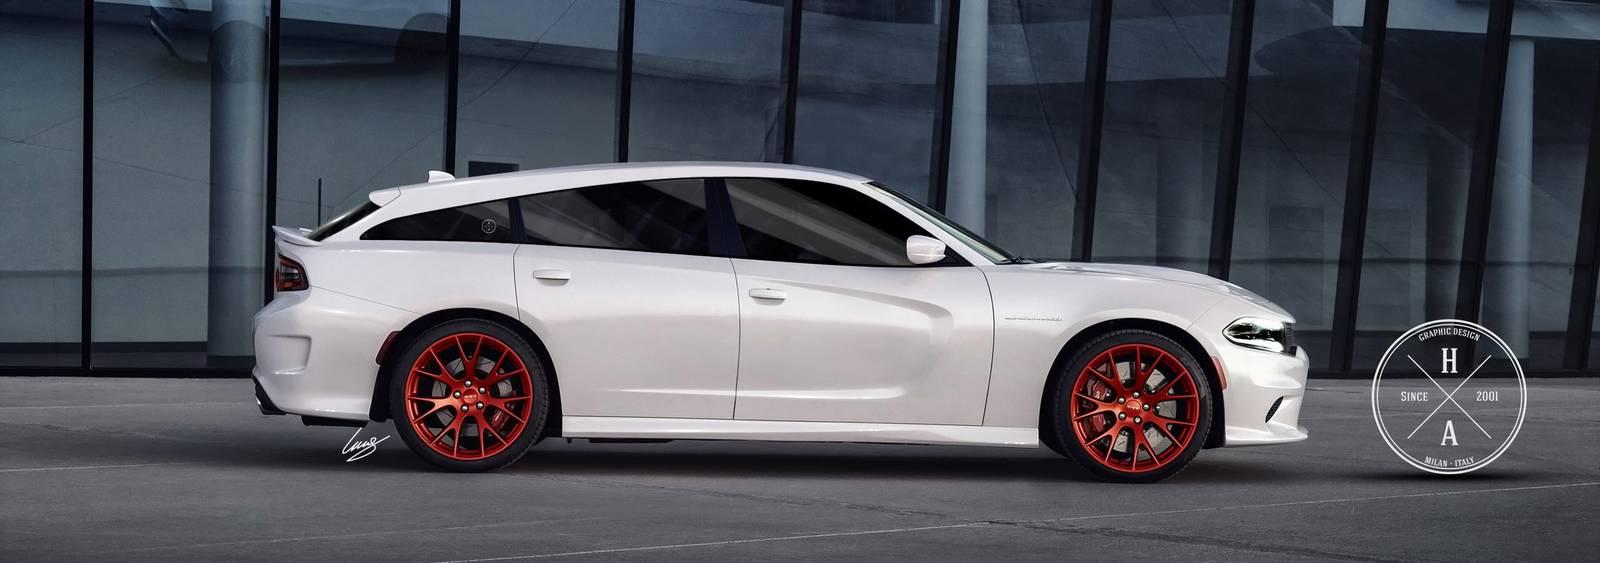 Hellcat Challenger For Sale >> Dodge Charger SRT Hellcat Shooting Brake Imagined - GTspirit